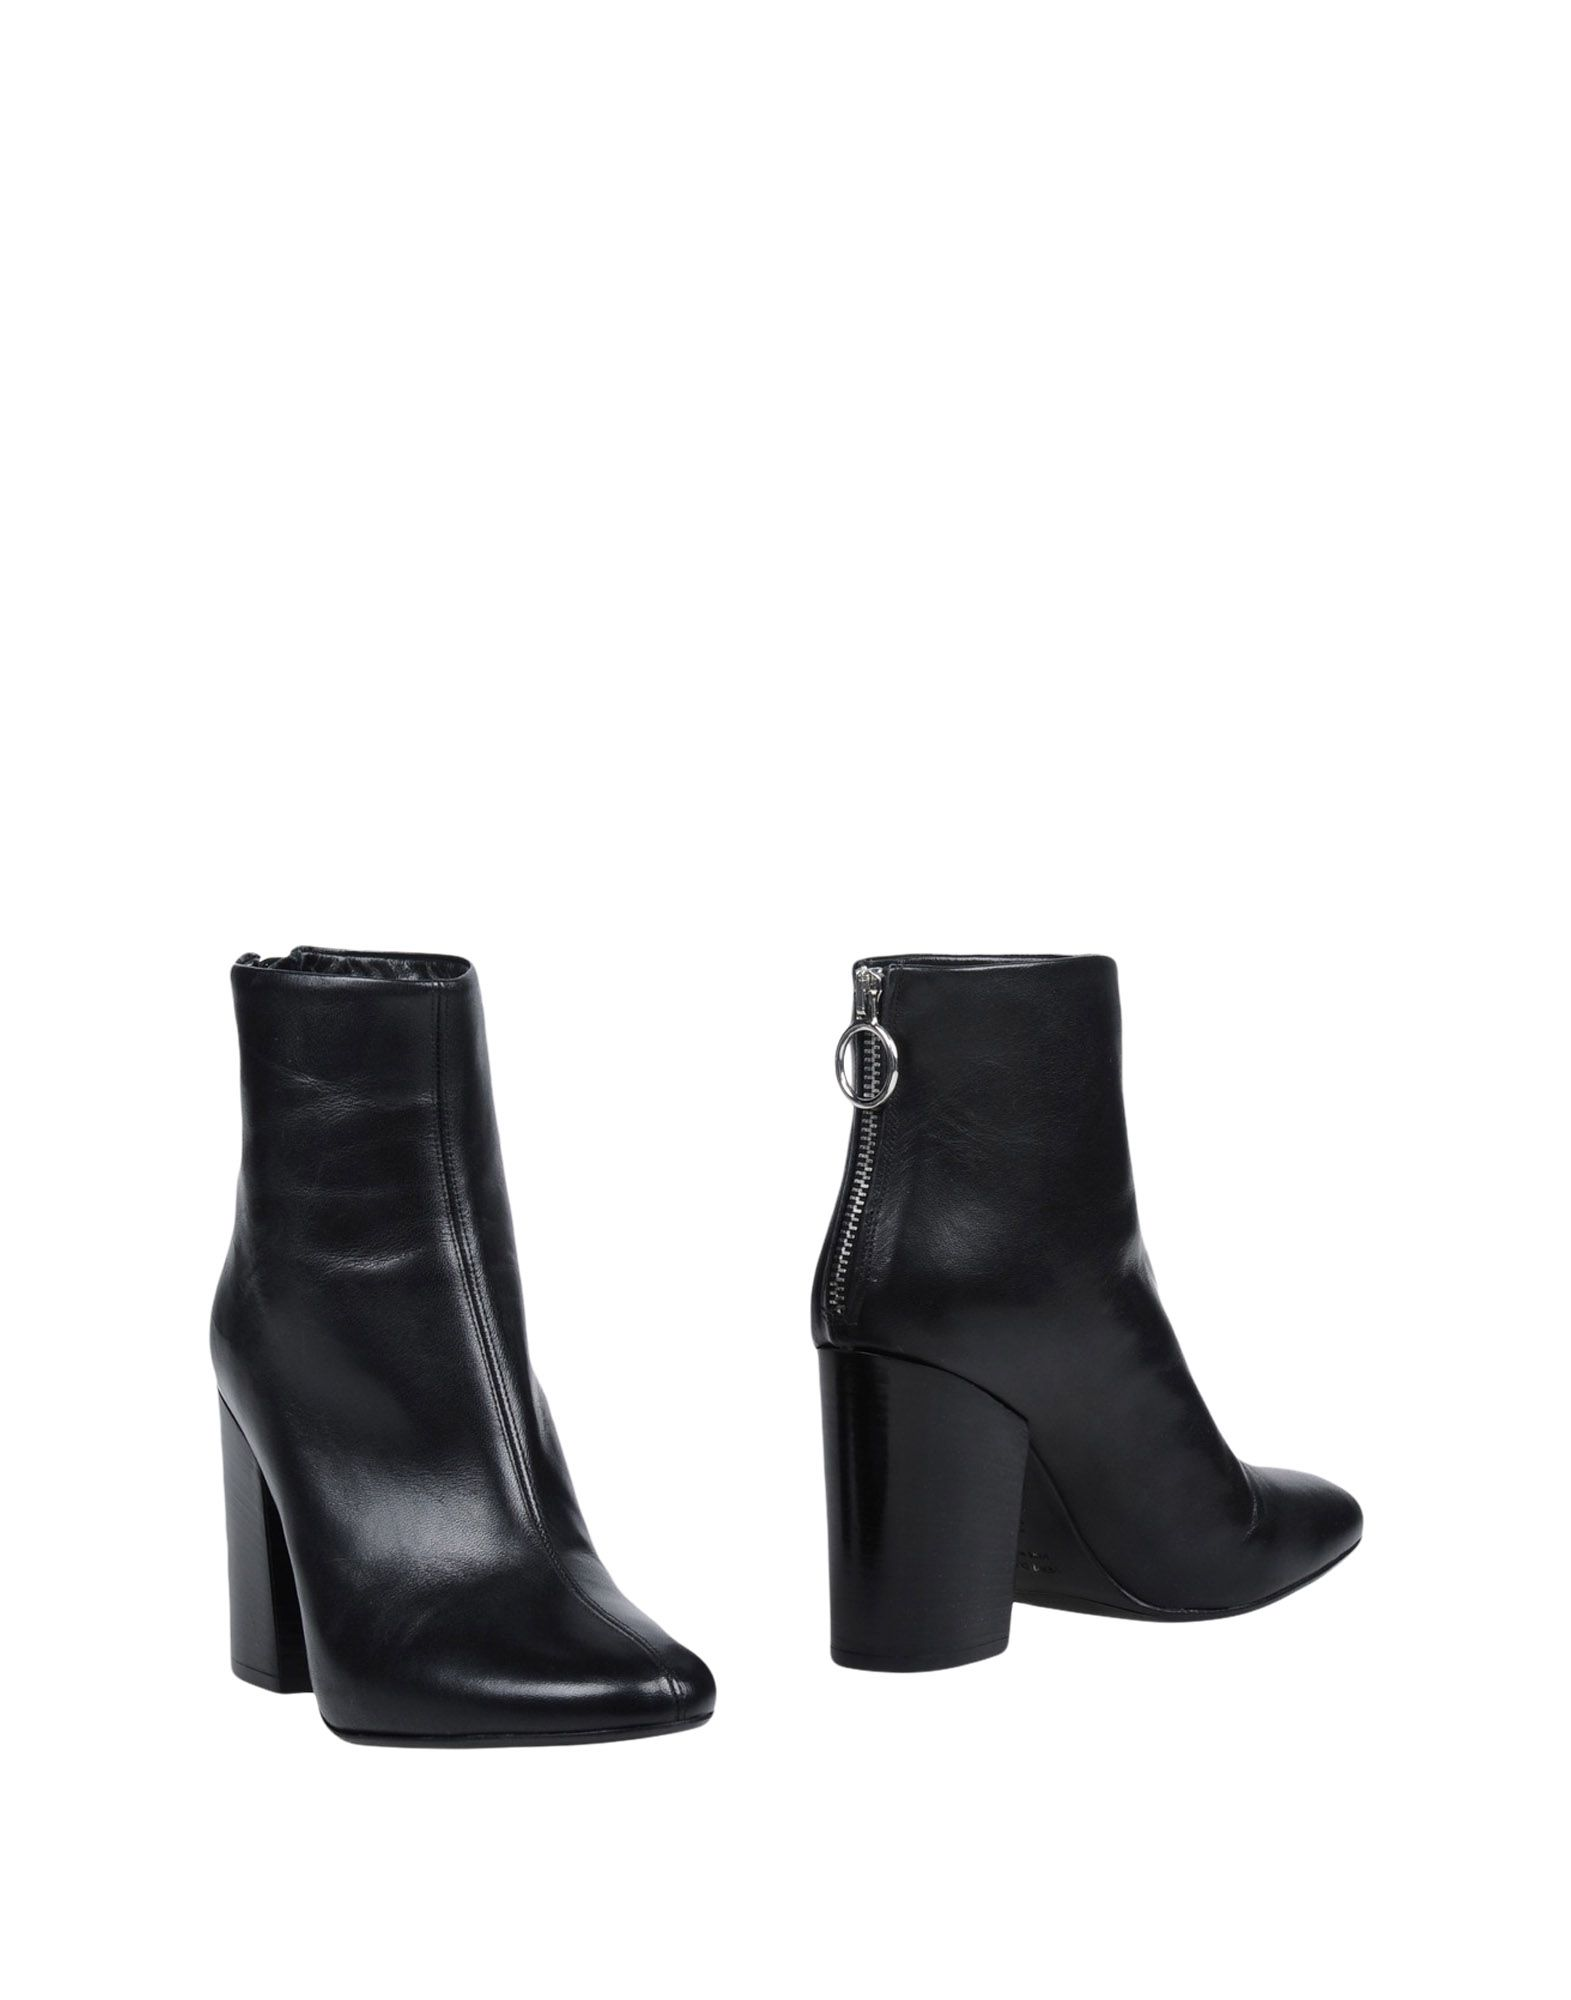 NICOLE BONNET Paris Полусапоги и высокие ботинки ботинки дерби из кожи nicole